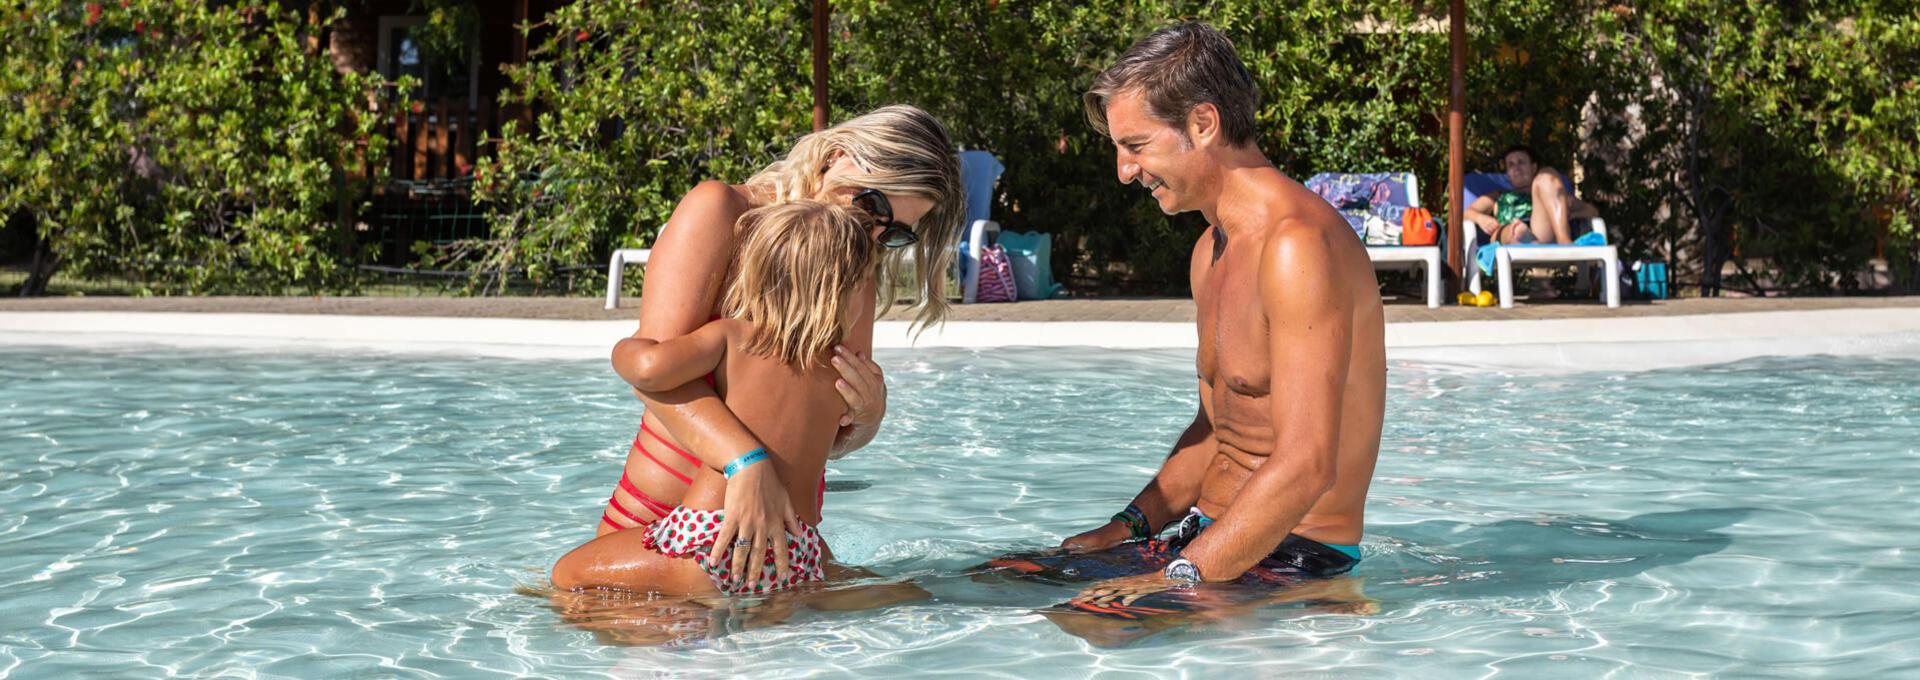 4mori fr village-touristique-avec-piscine-sardaigne 017